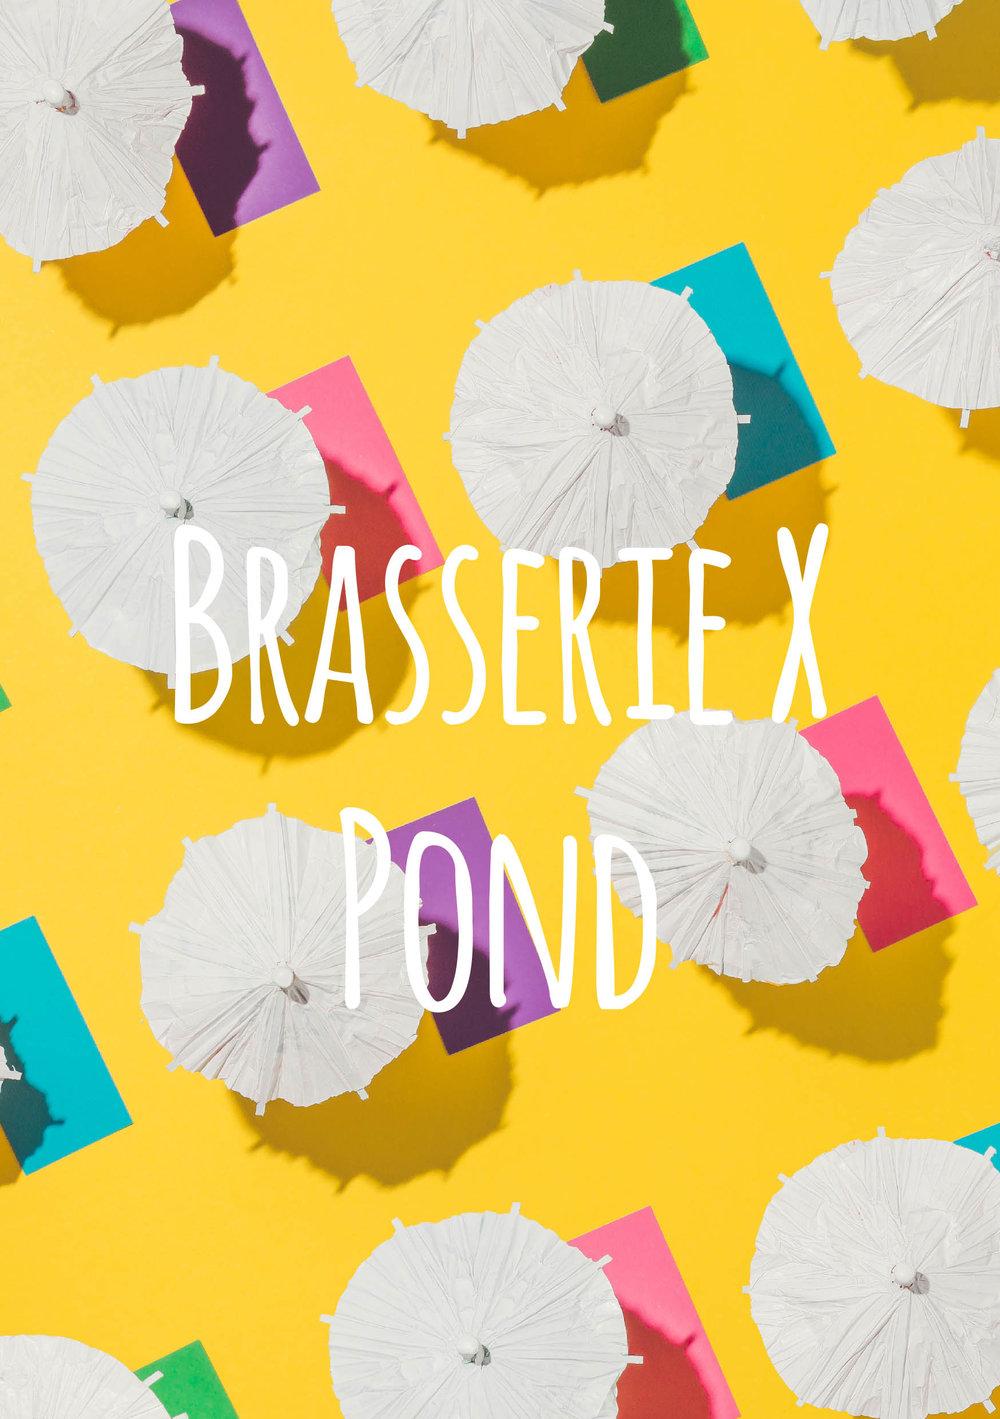 brasseriex_pond.jpg